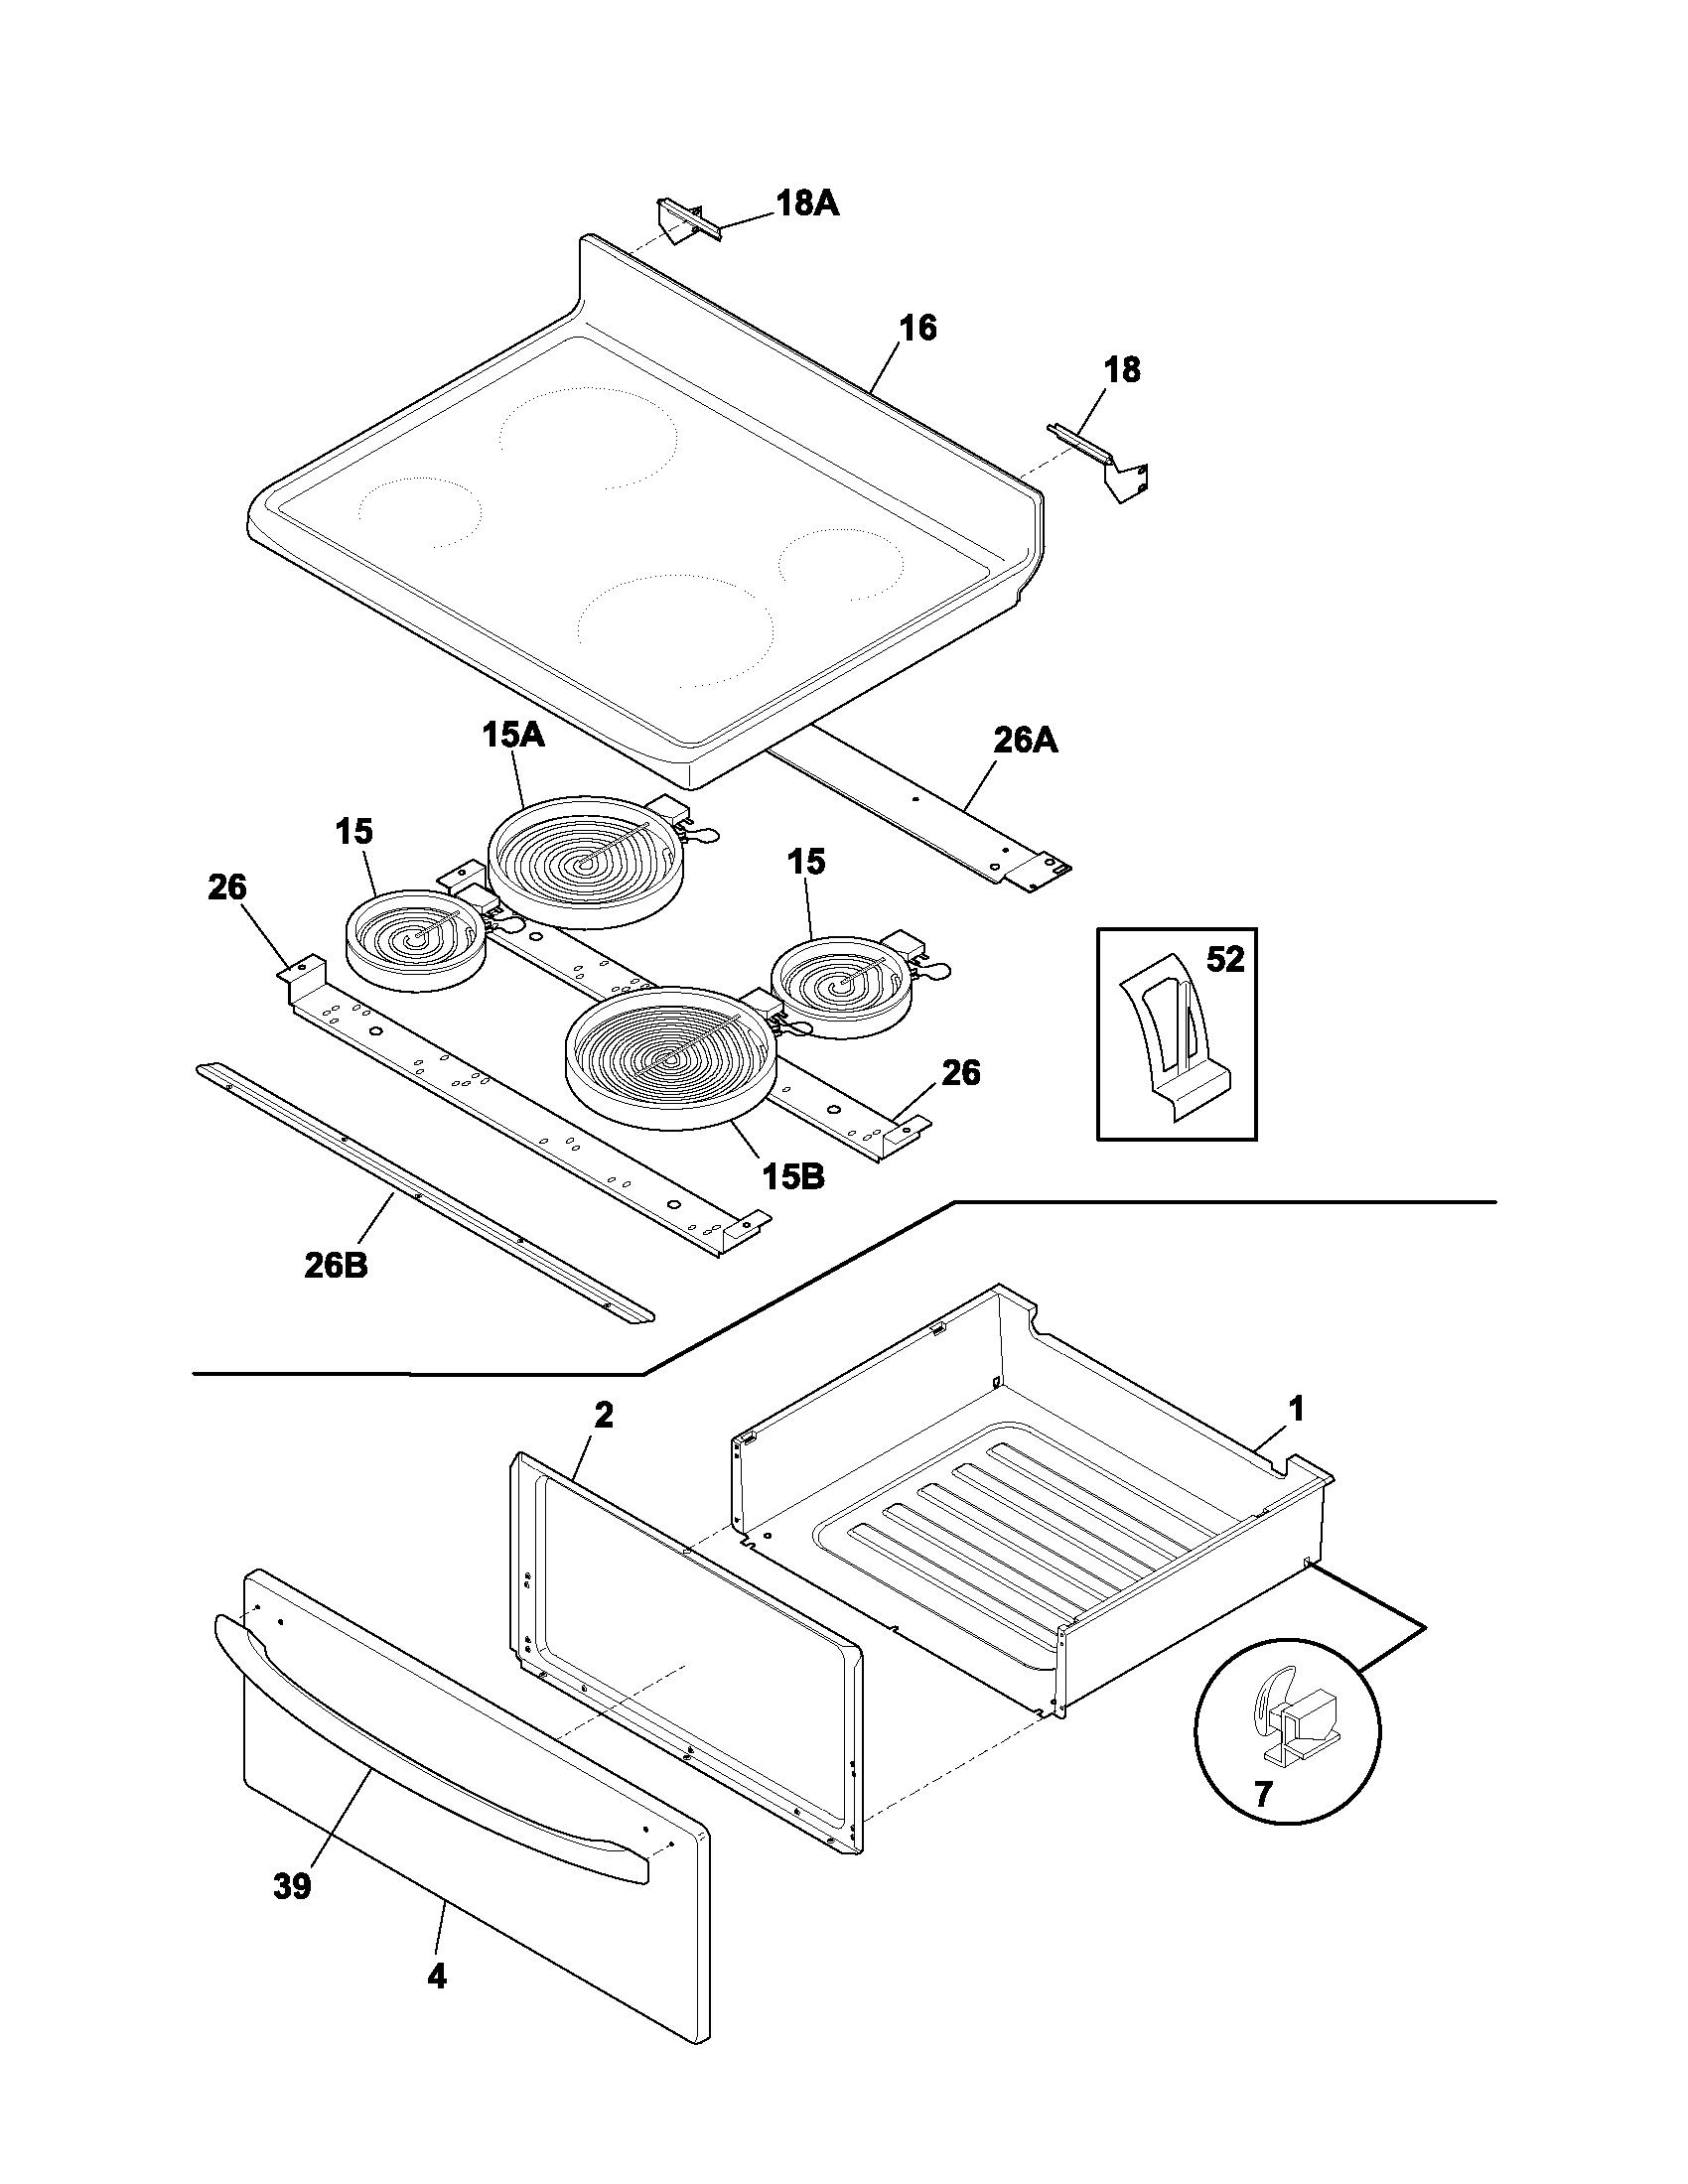 Frigidaire stove schematic free download wiring diagram